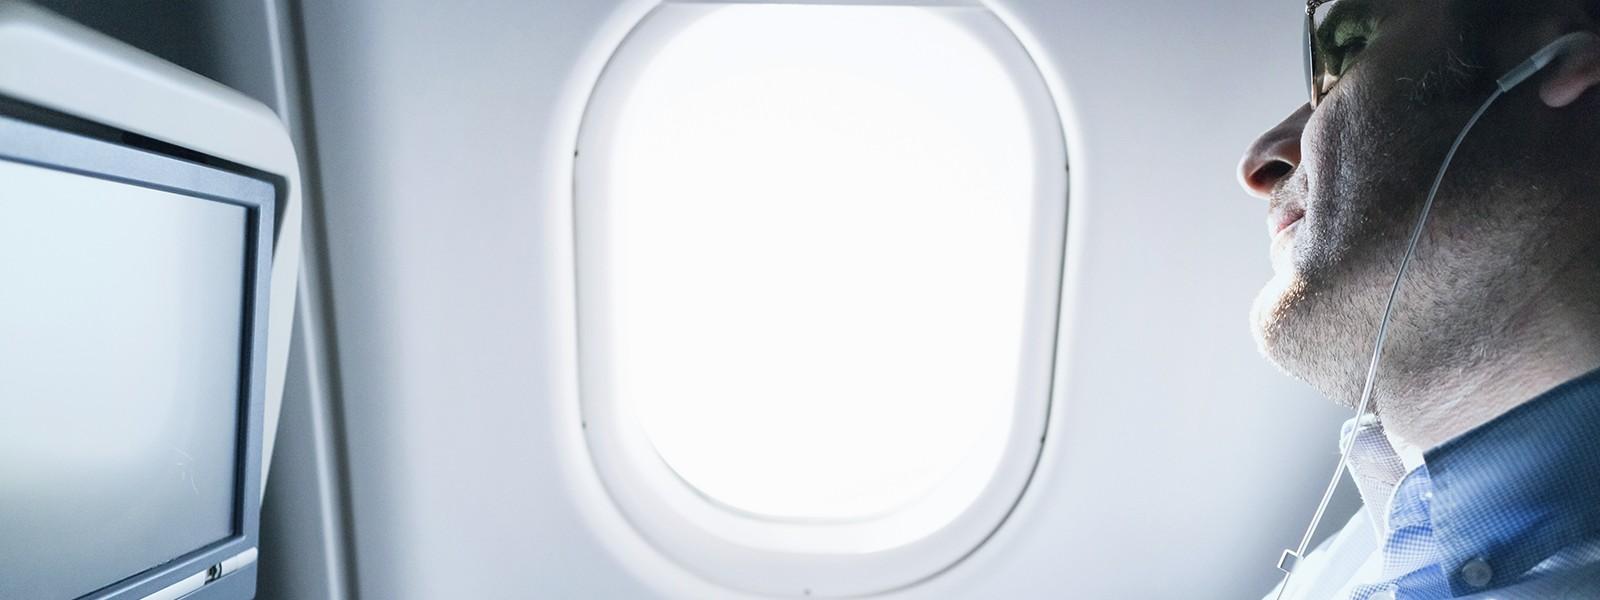 Businessman  using digital tablet  on airplane.